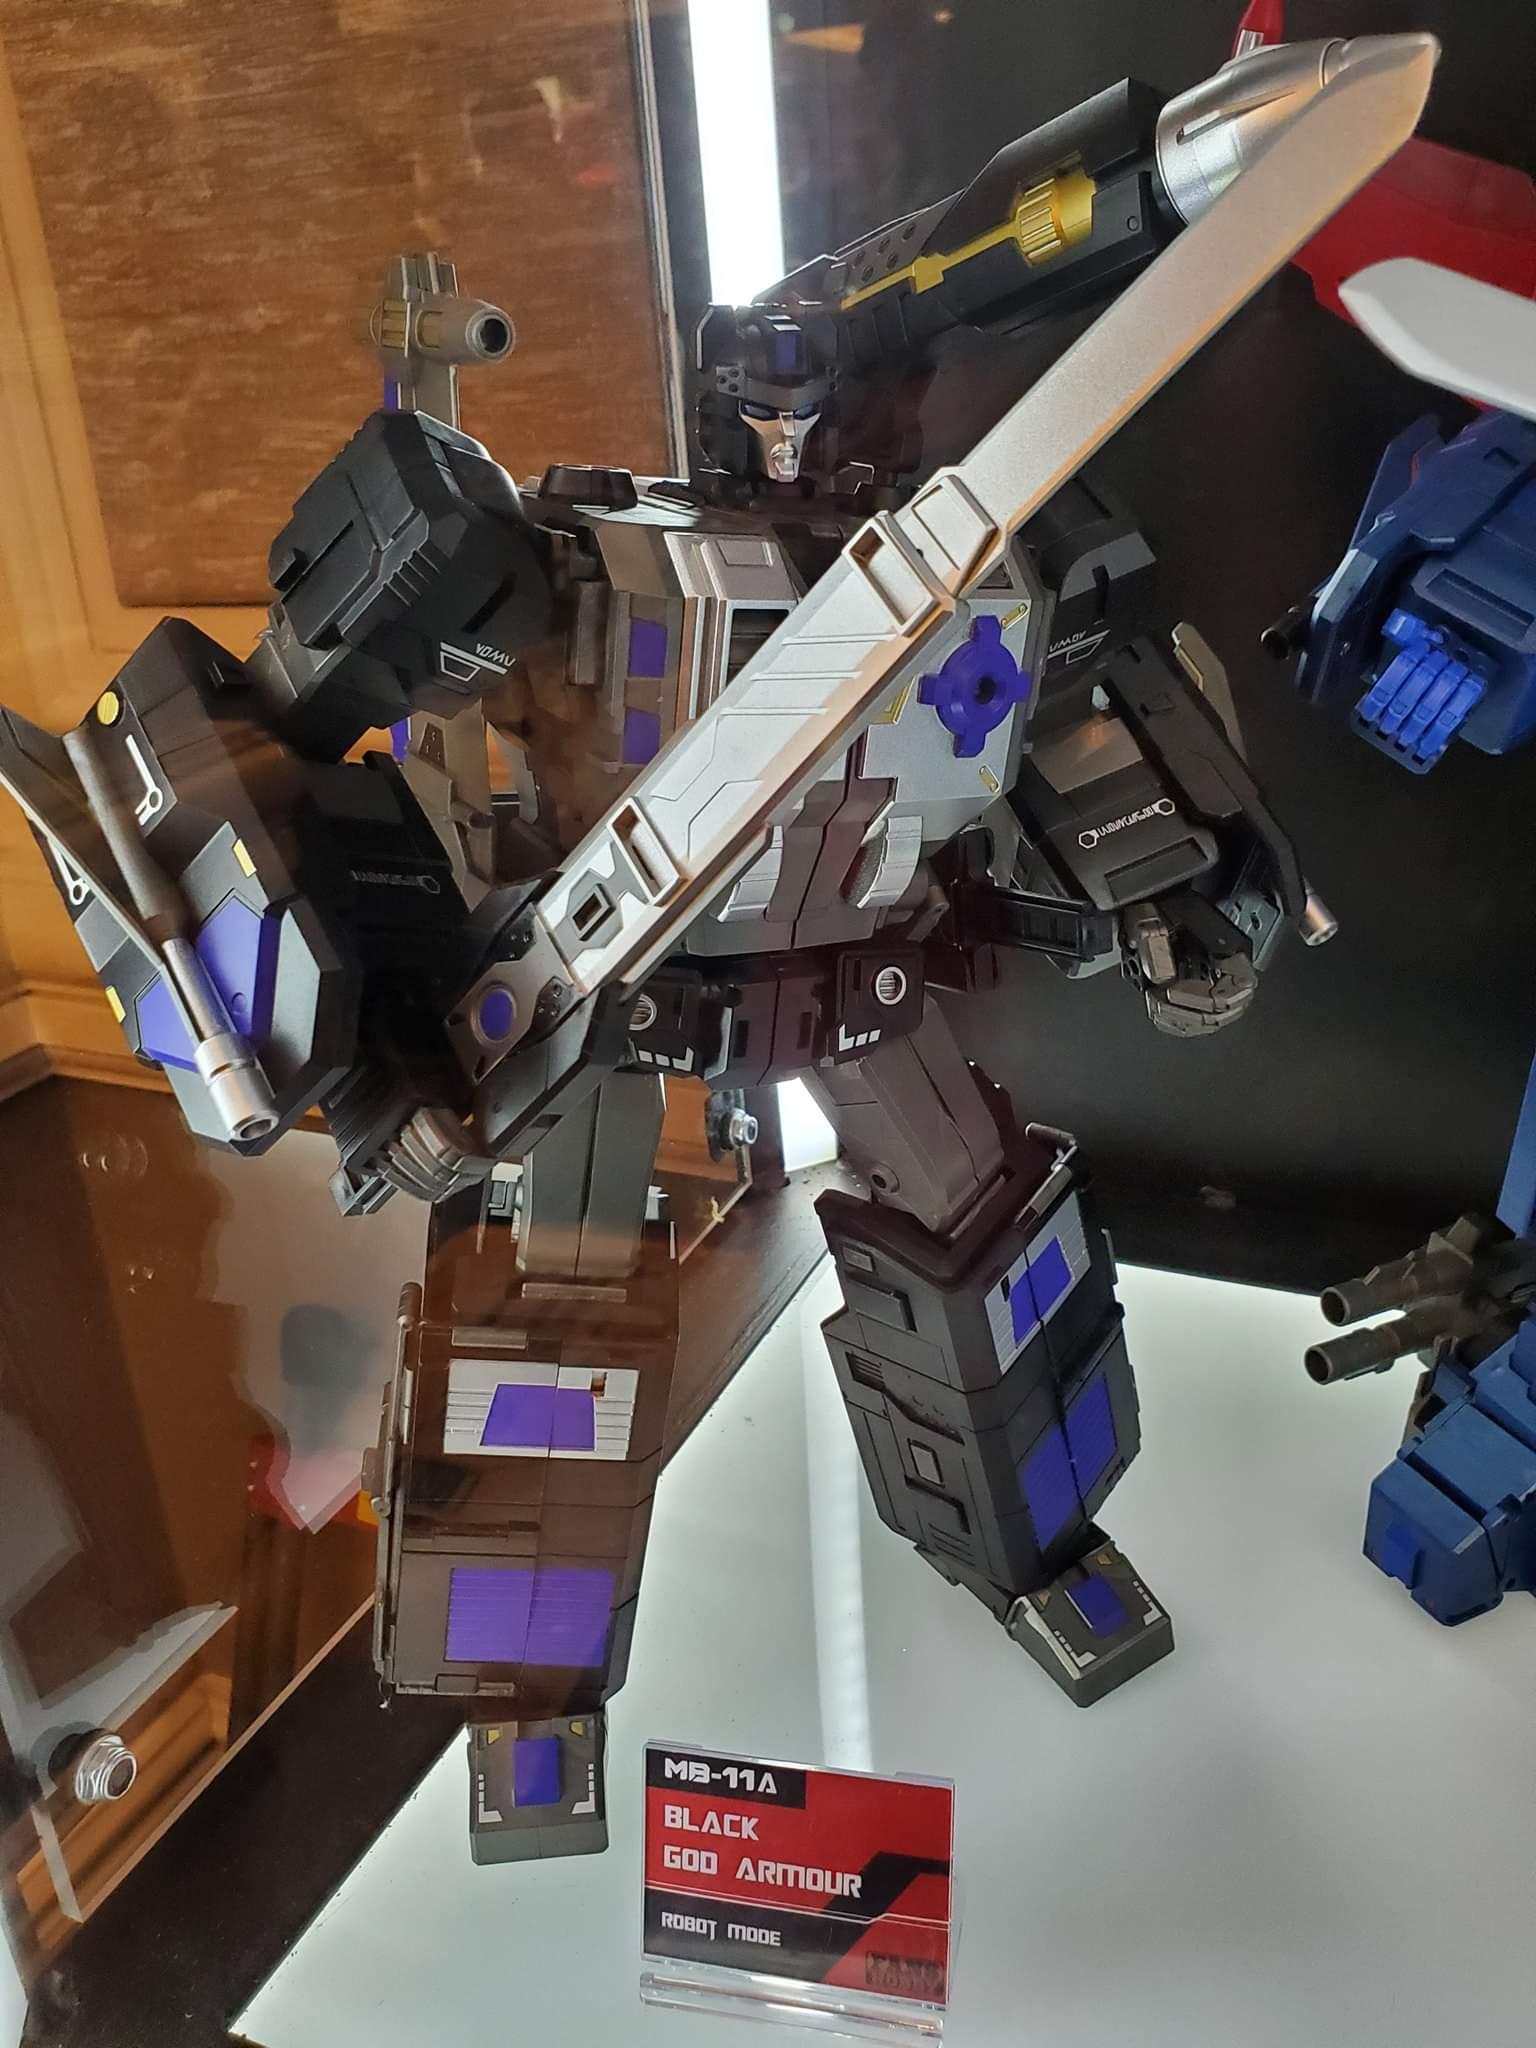 [FansHobby] Produit Tiers - MB-06 Power Baser (aka Powermaster Optimus) + MB-11 God Armour (aka Godbomber) - TF Masterforce - Page 4 KUcDcrzU_o